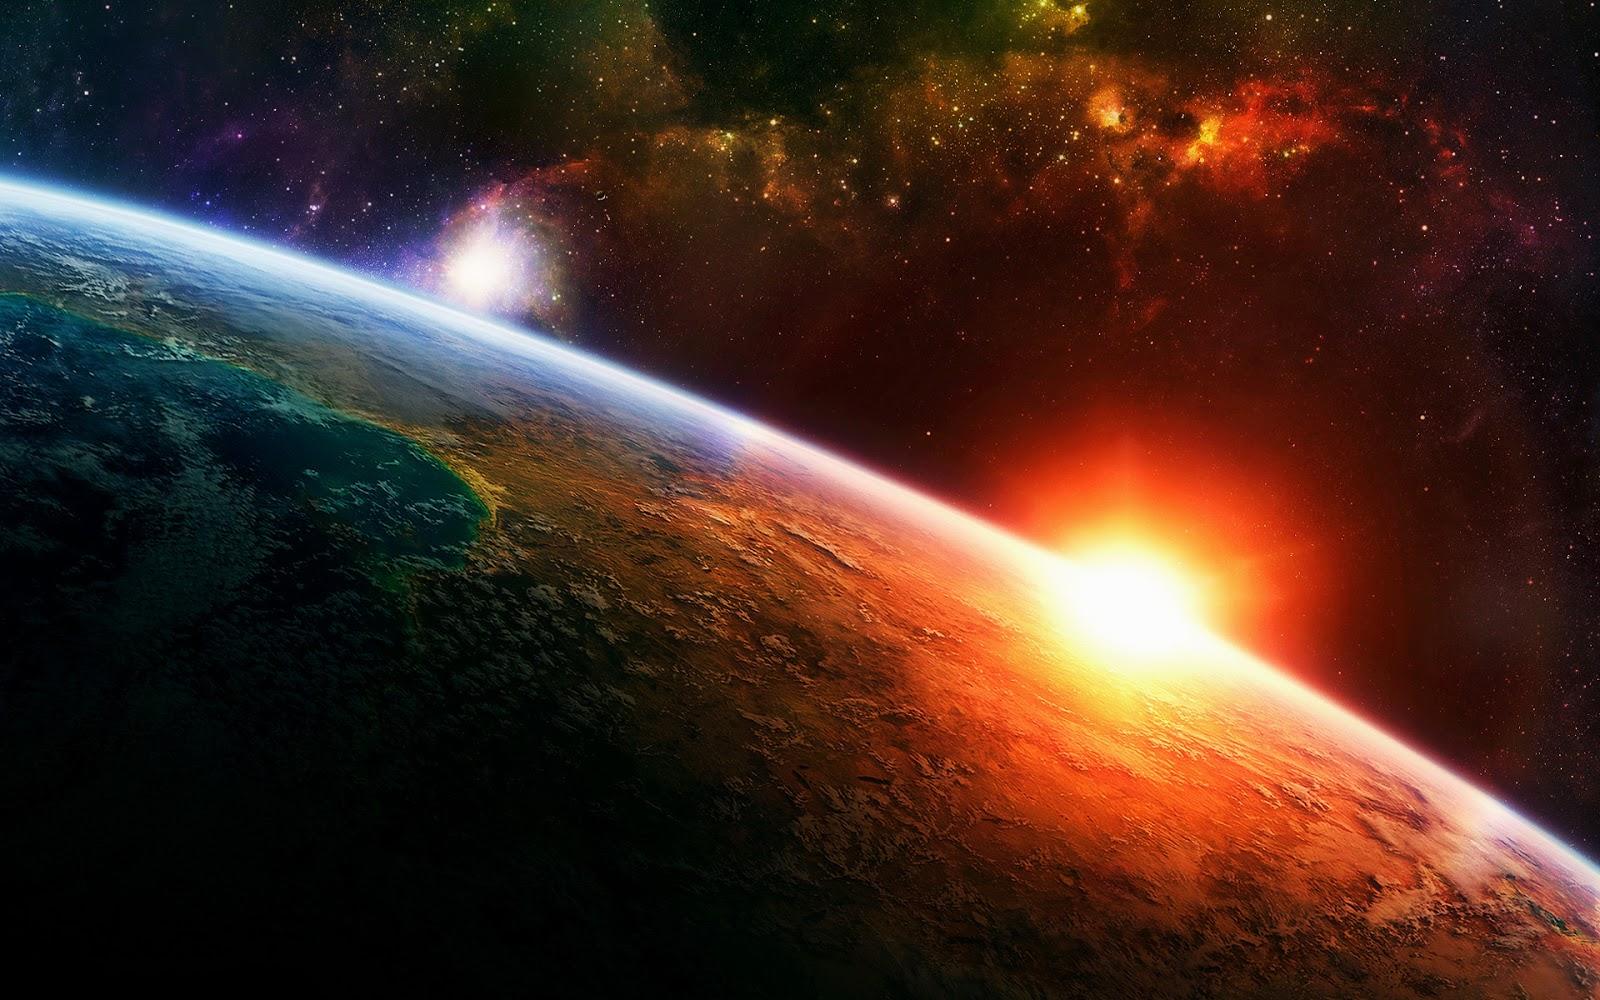 http://1.bp.blogspot.com/-b3ZmUrrtAV4/UJx8vV6M_hI/AAAAAAAALAA/6Lj3AzZ9C0I/s1600/6028_3d_space_scene_hd_wallpapers_sunset.jpg